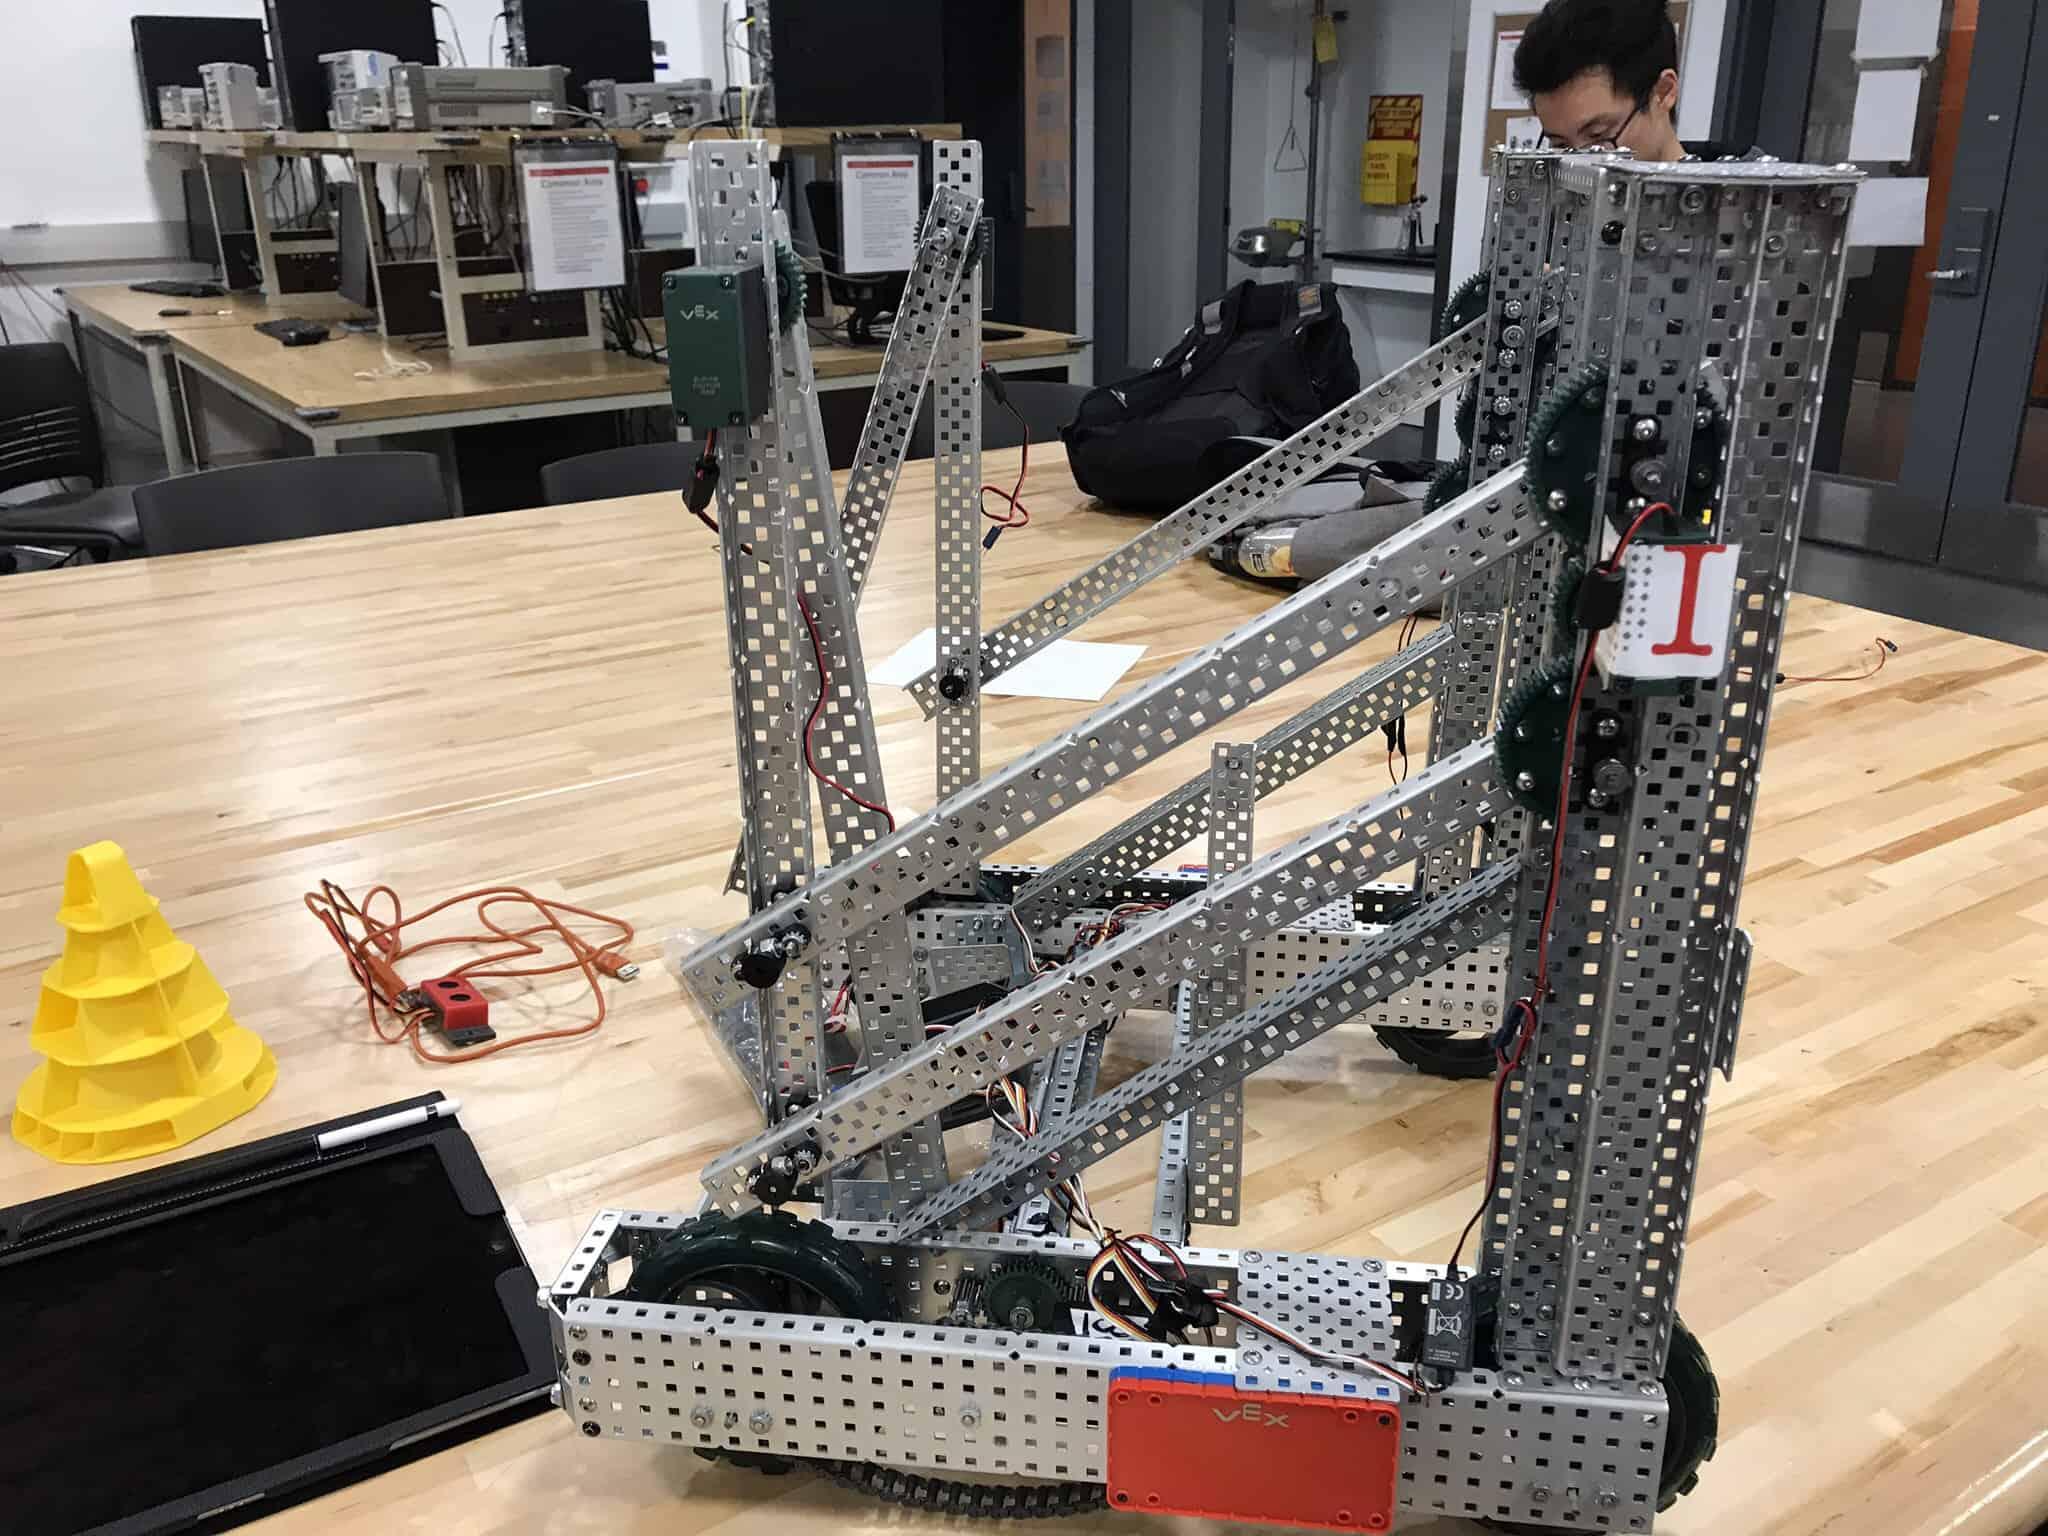 vex team a robot design irobotics. Black Bedroom Furniture Sets. Home Design Ideas